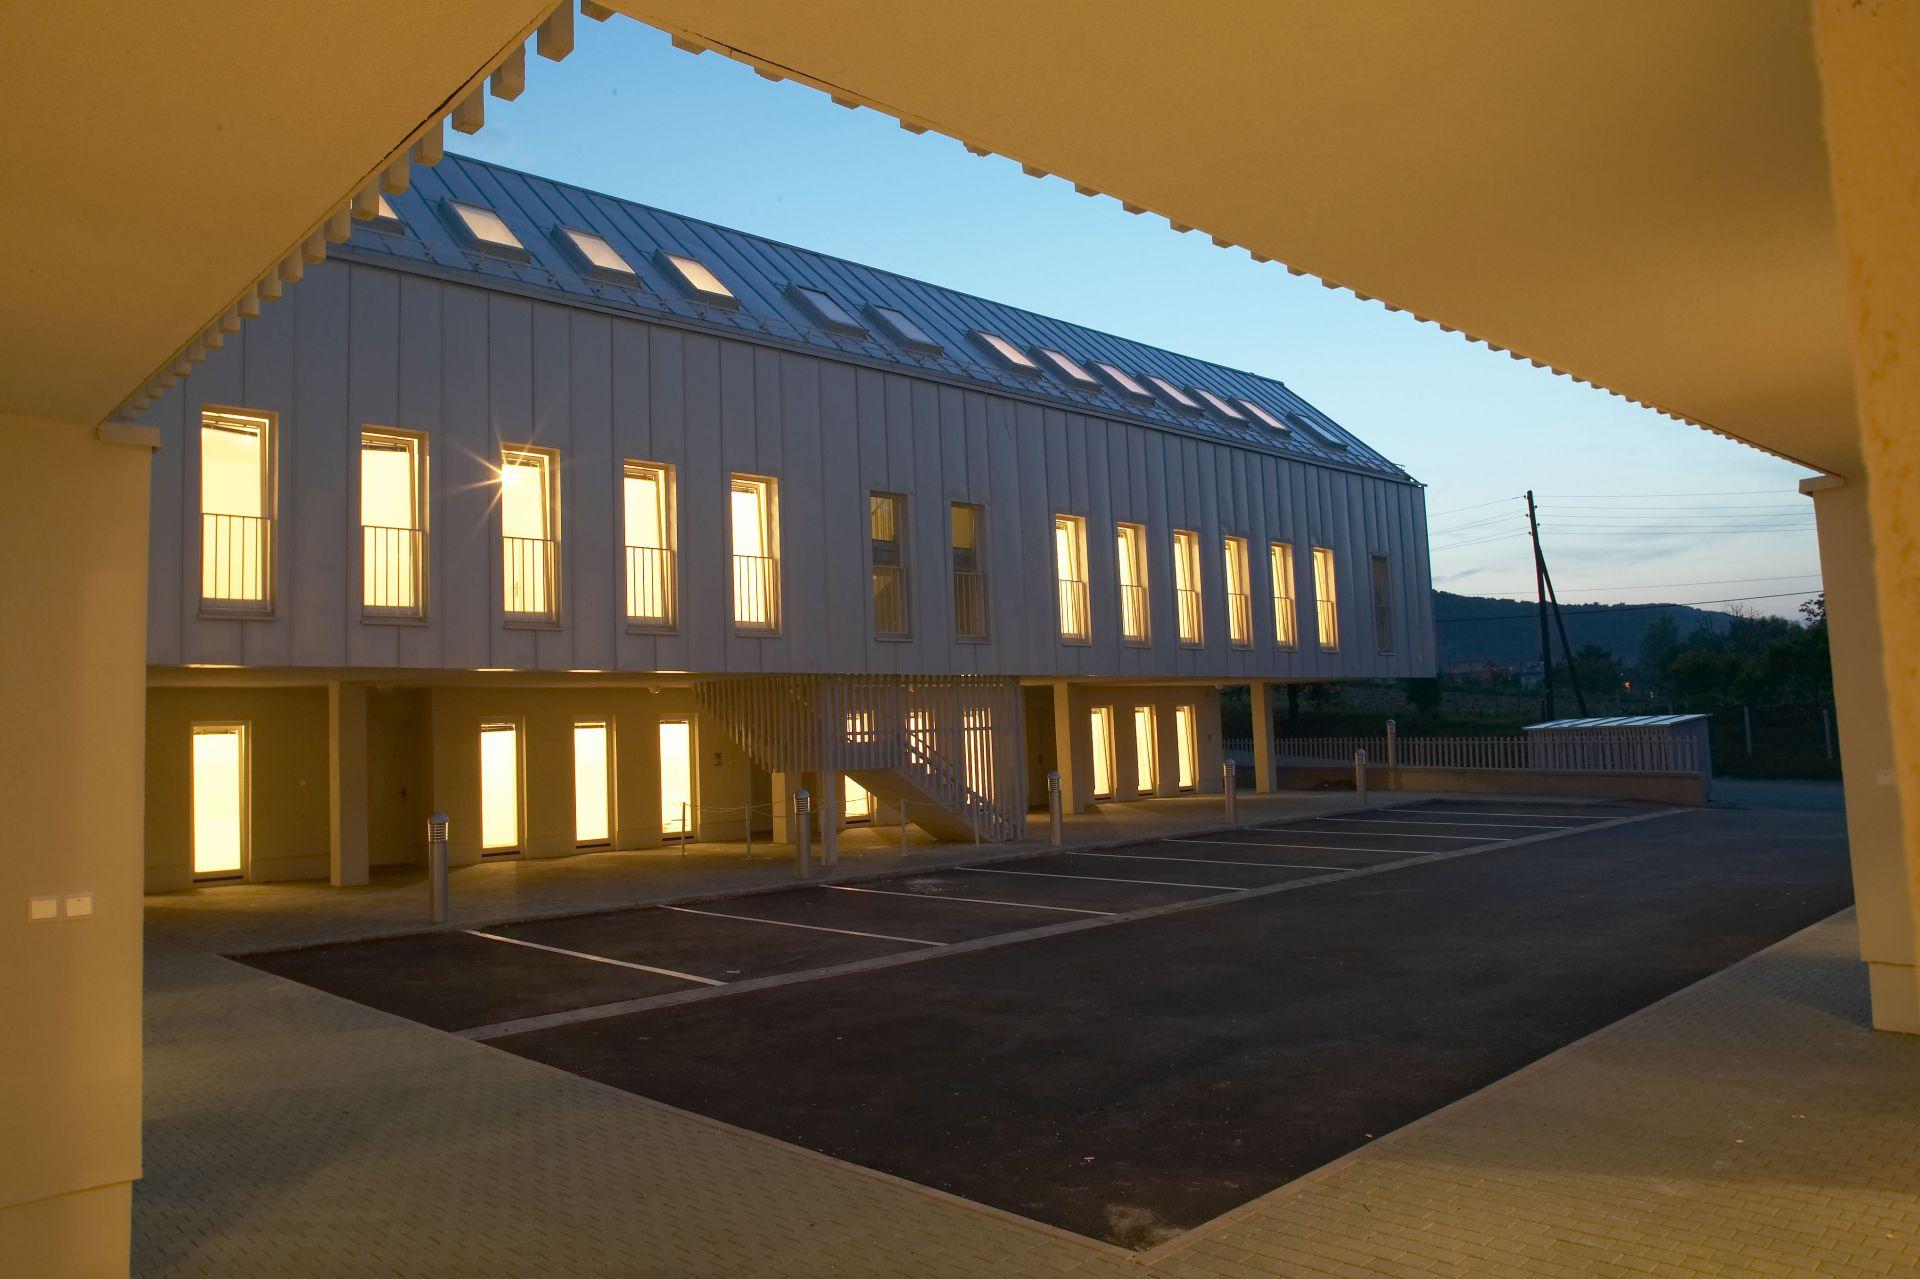 POS Samobor, POS, APN; Iva Letilović, Morana Vlahović, UPI-2M, konstrukcija, Samobor, croatia, structure, concrete, beton